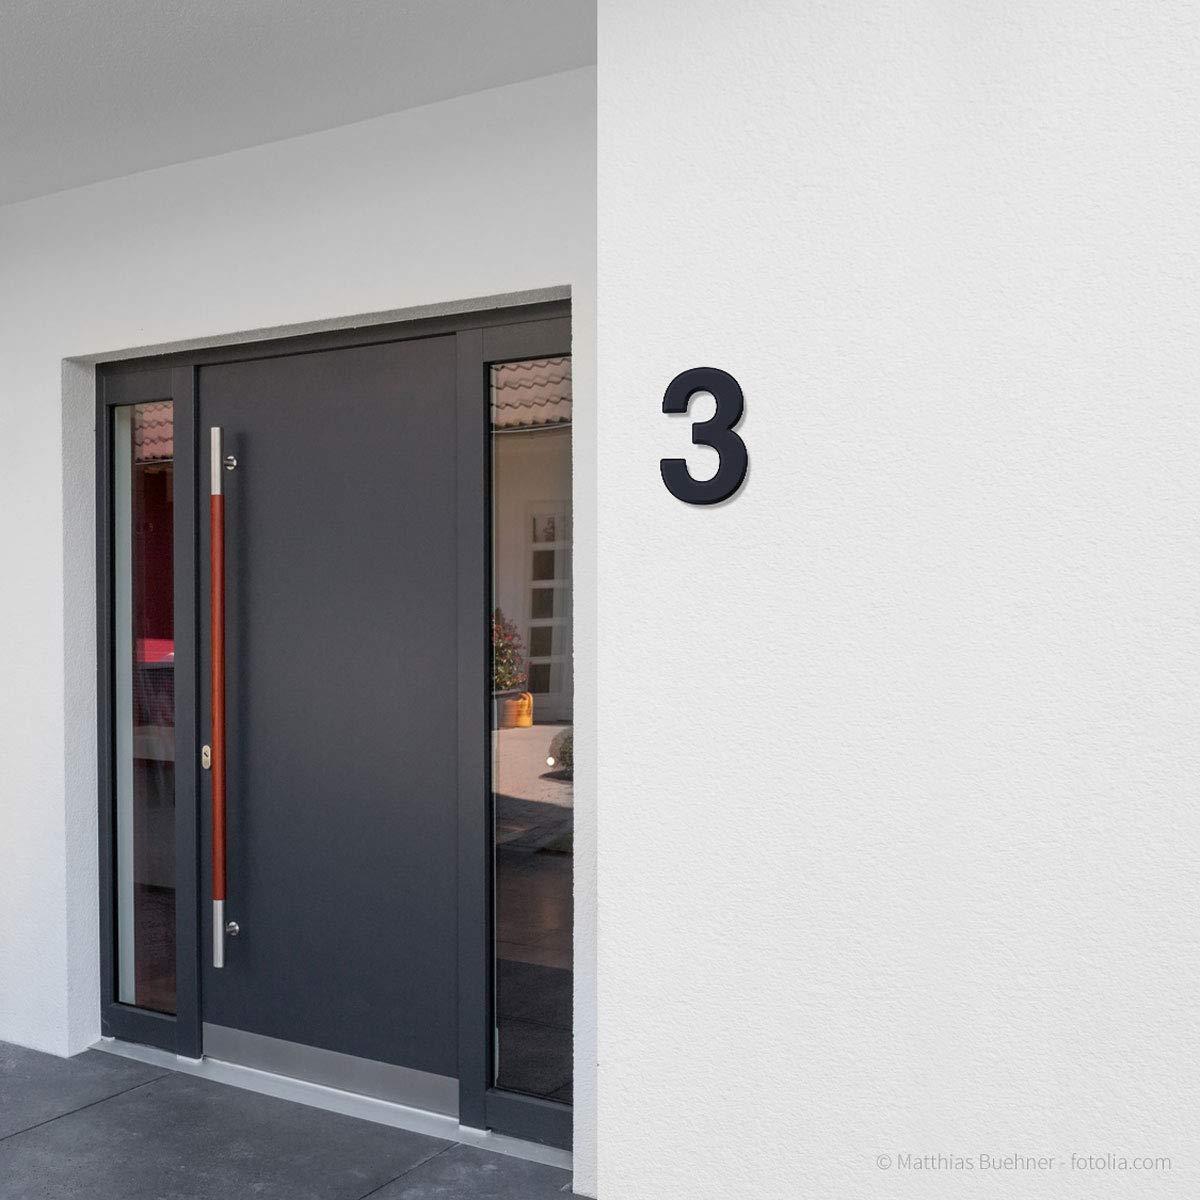 grau 30cm 2 Thorwa/® Design V2A Edelstahl Hausnummer Feinstruktur beschichtet RAL 7016 anthrazit